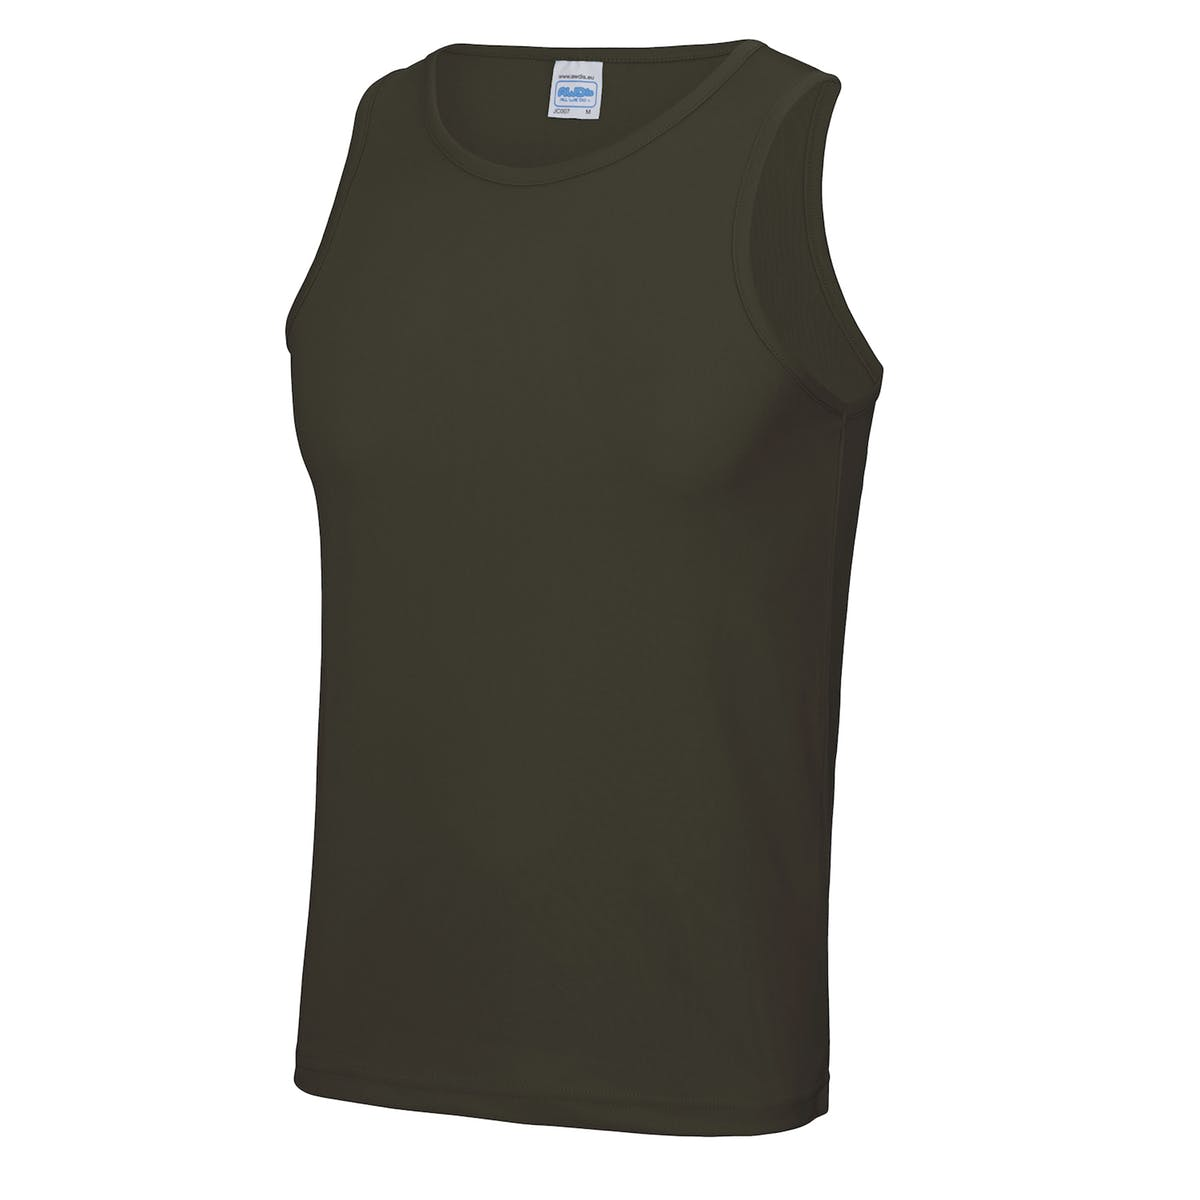 olive green sports vest